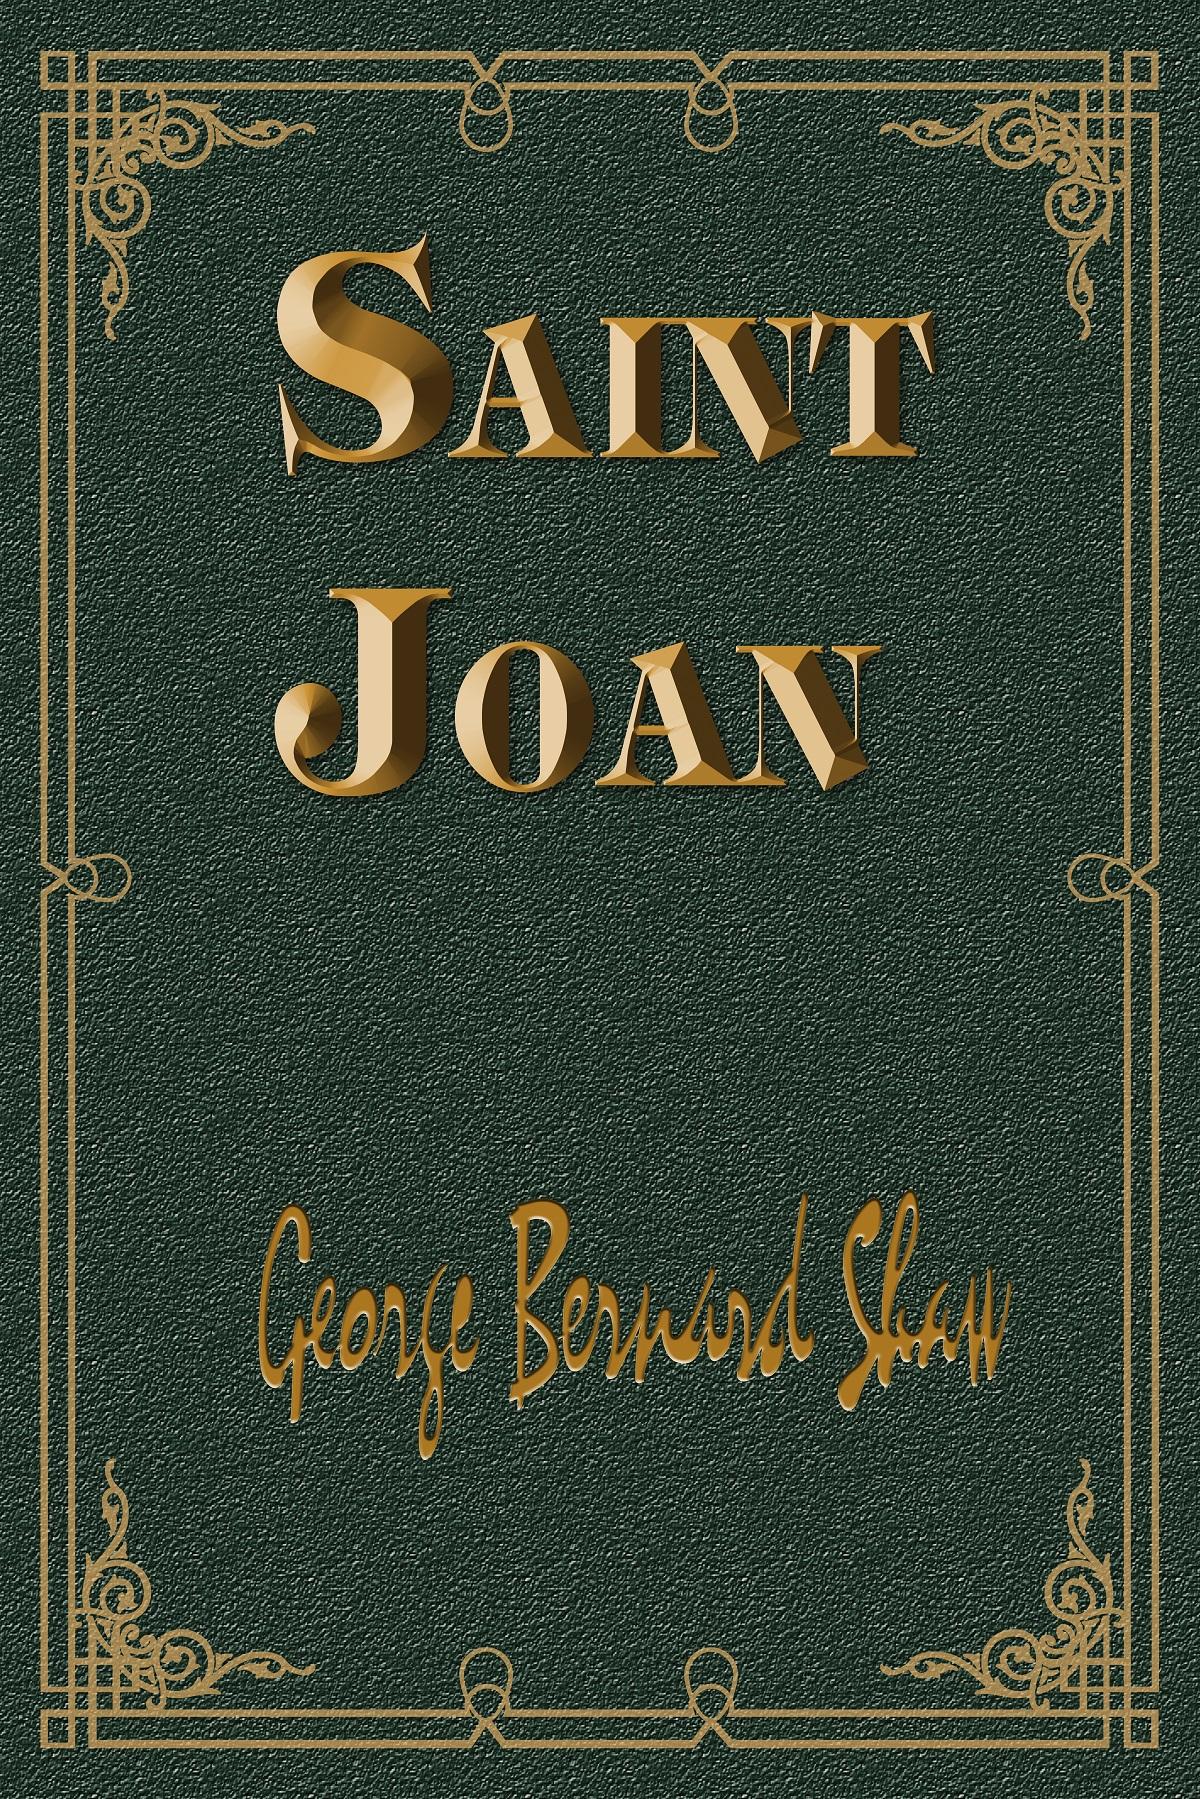 圣女貞德 Saint Joan